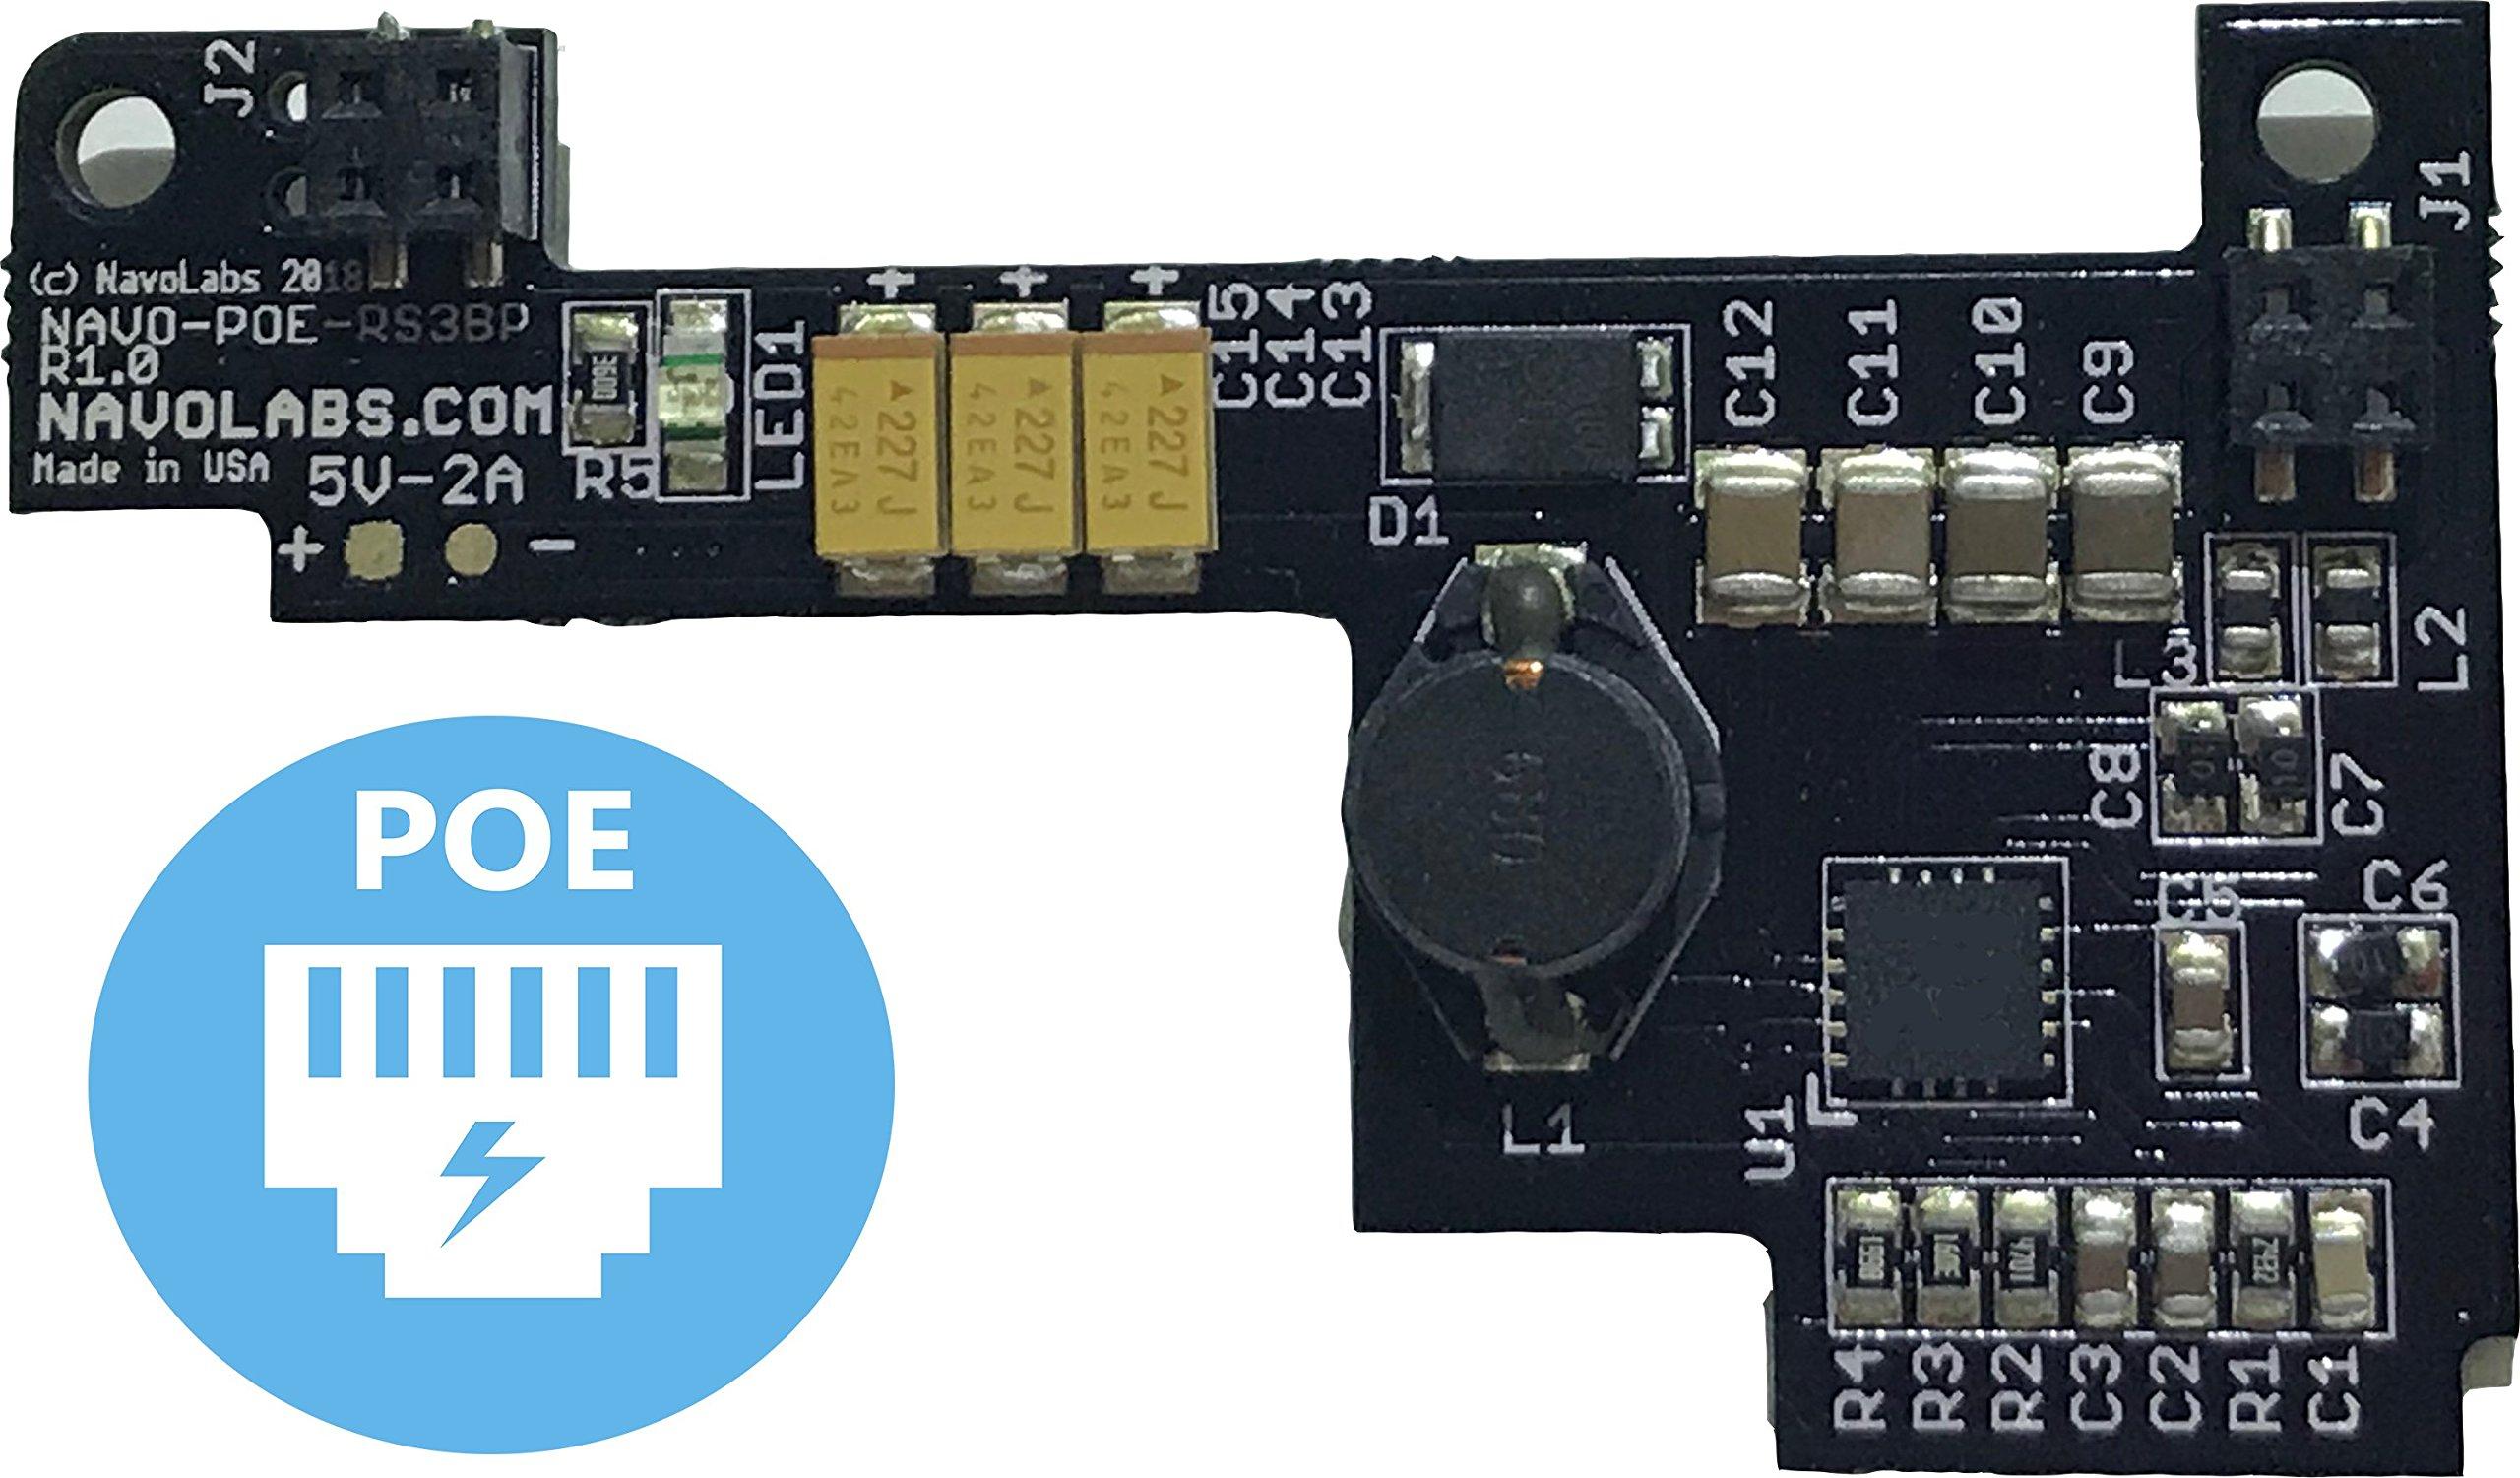 NavoLabs Raspberry Pi 3B+ POE Hat